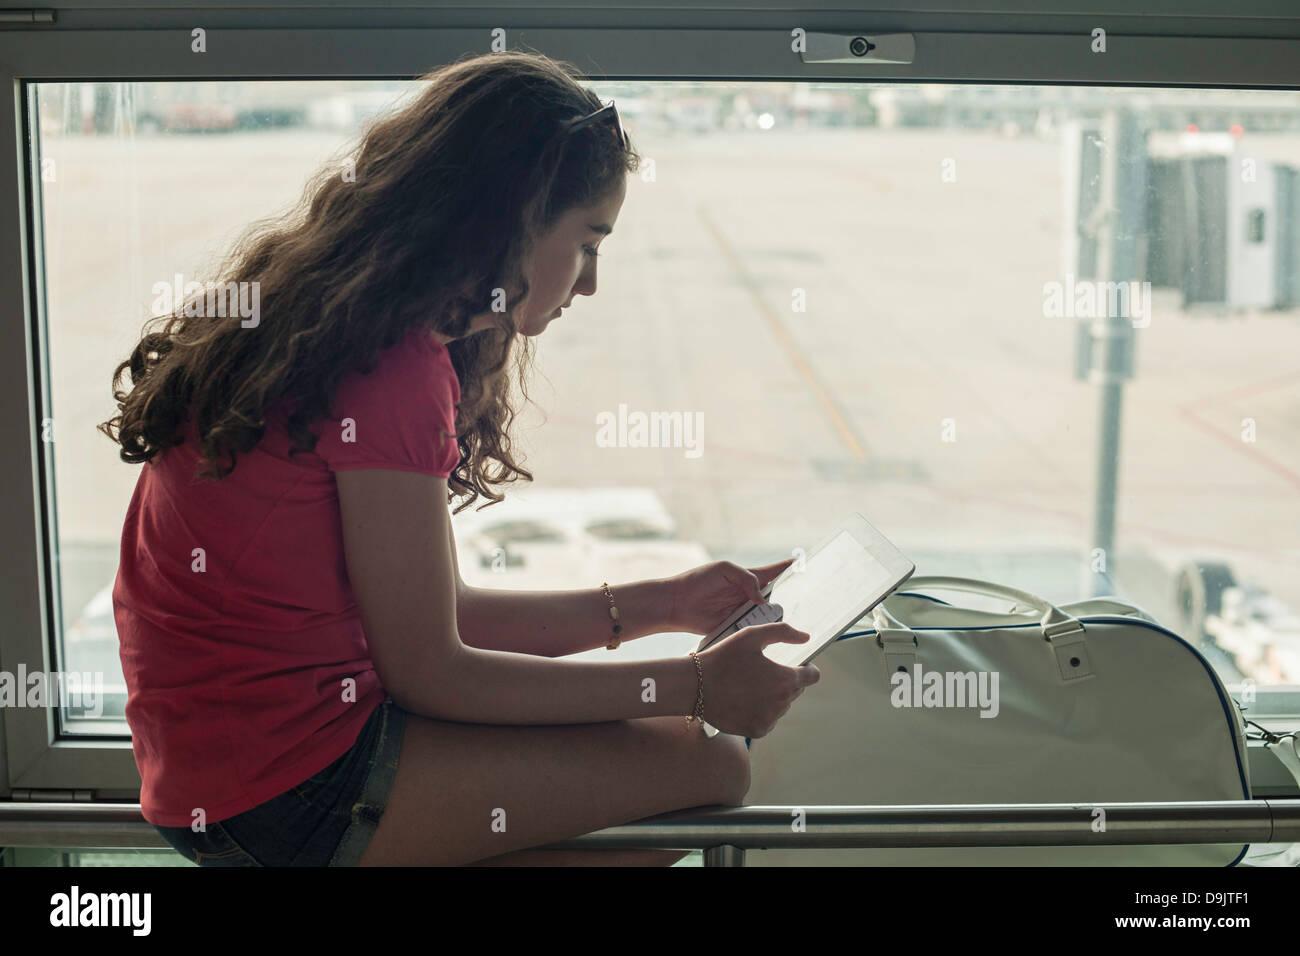 Teenage girl using digital tablet - Stock Image